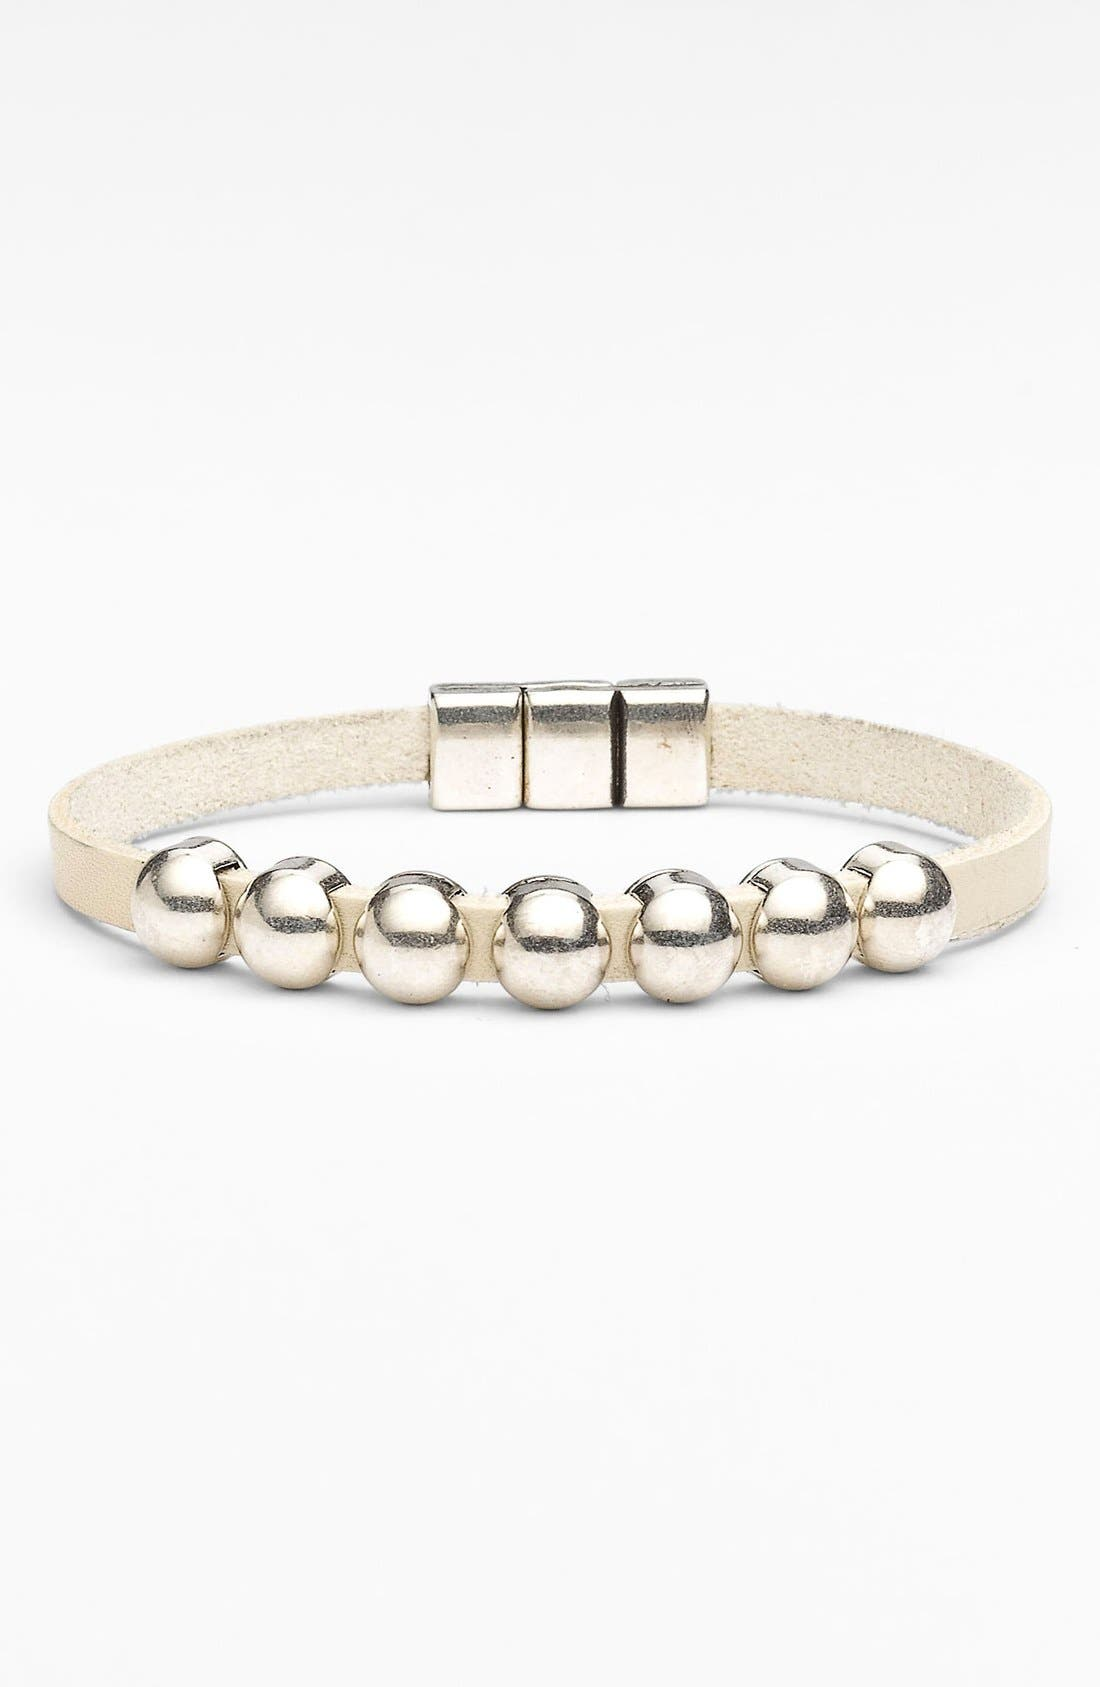 Main Image - Will Leather Goods Bracelet